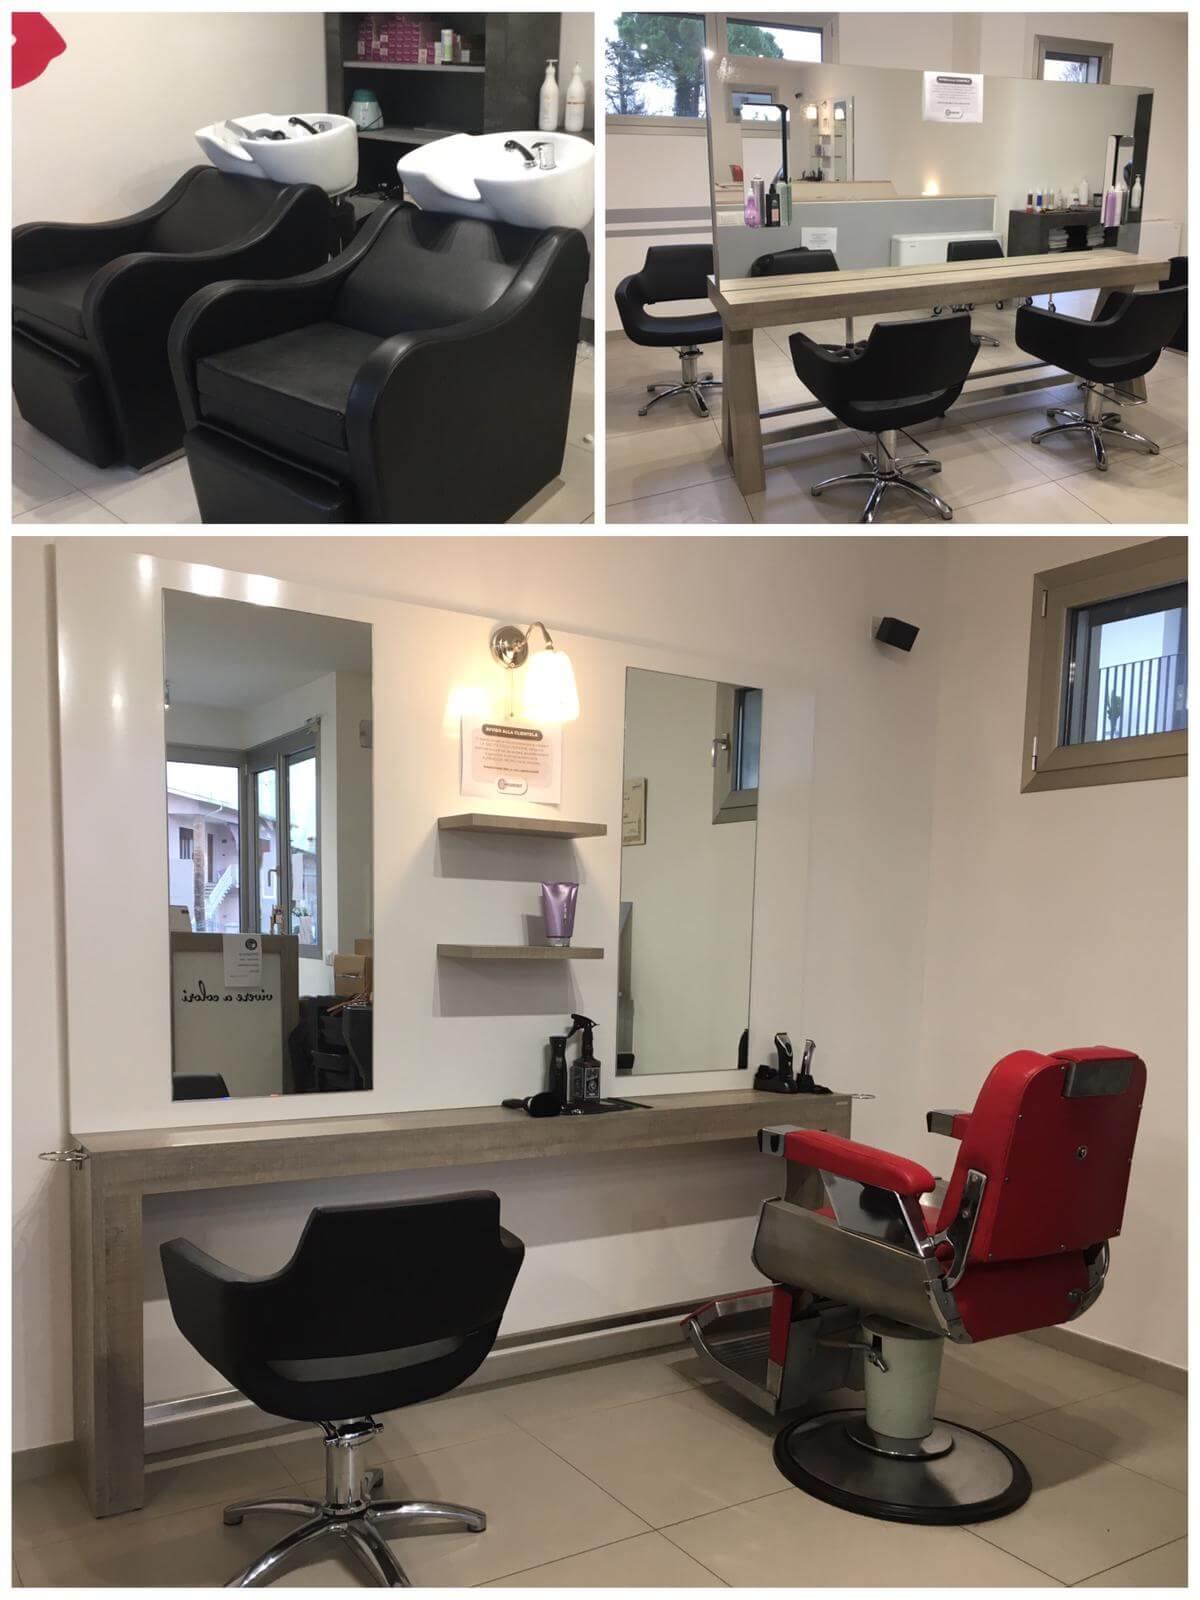 Specchio centrale per parrucchieri fab